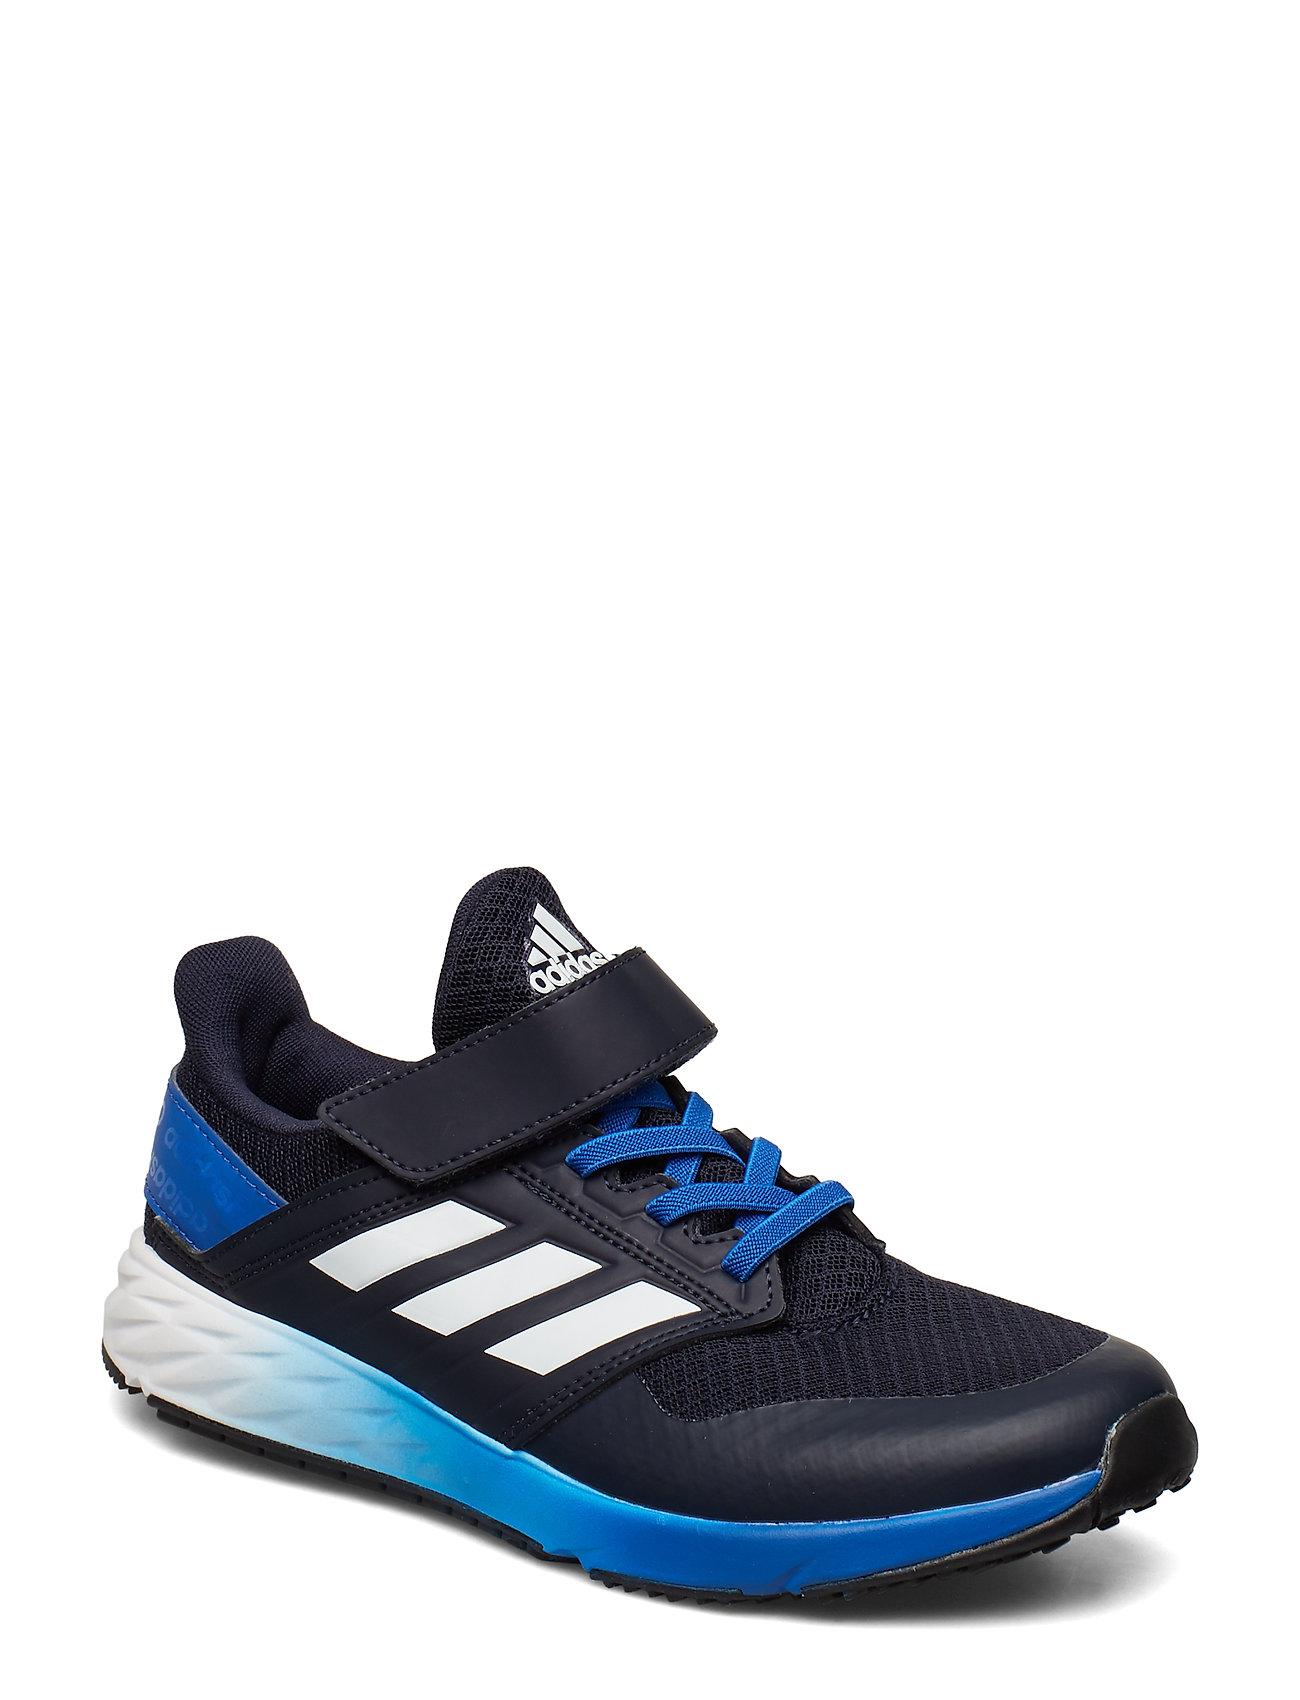 adidas Performance FortaFaito EL K - LEGINK/FTWWHT/BLUE